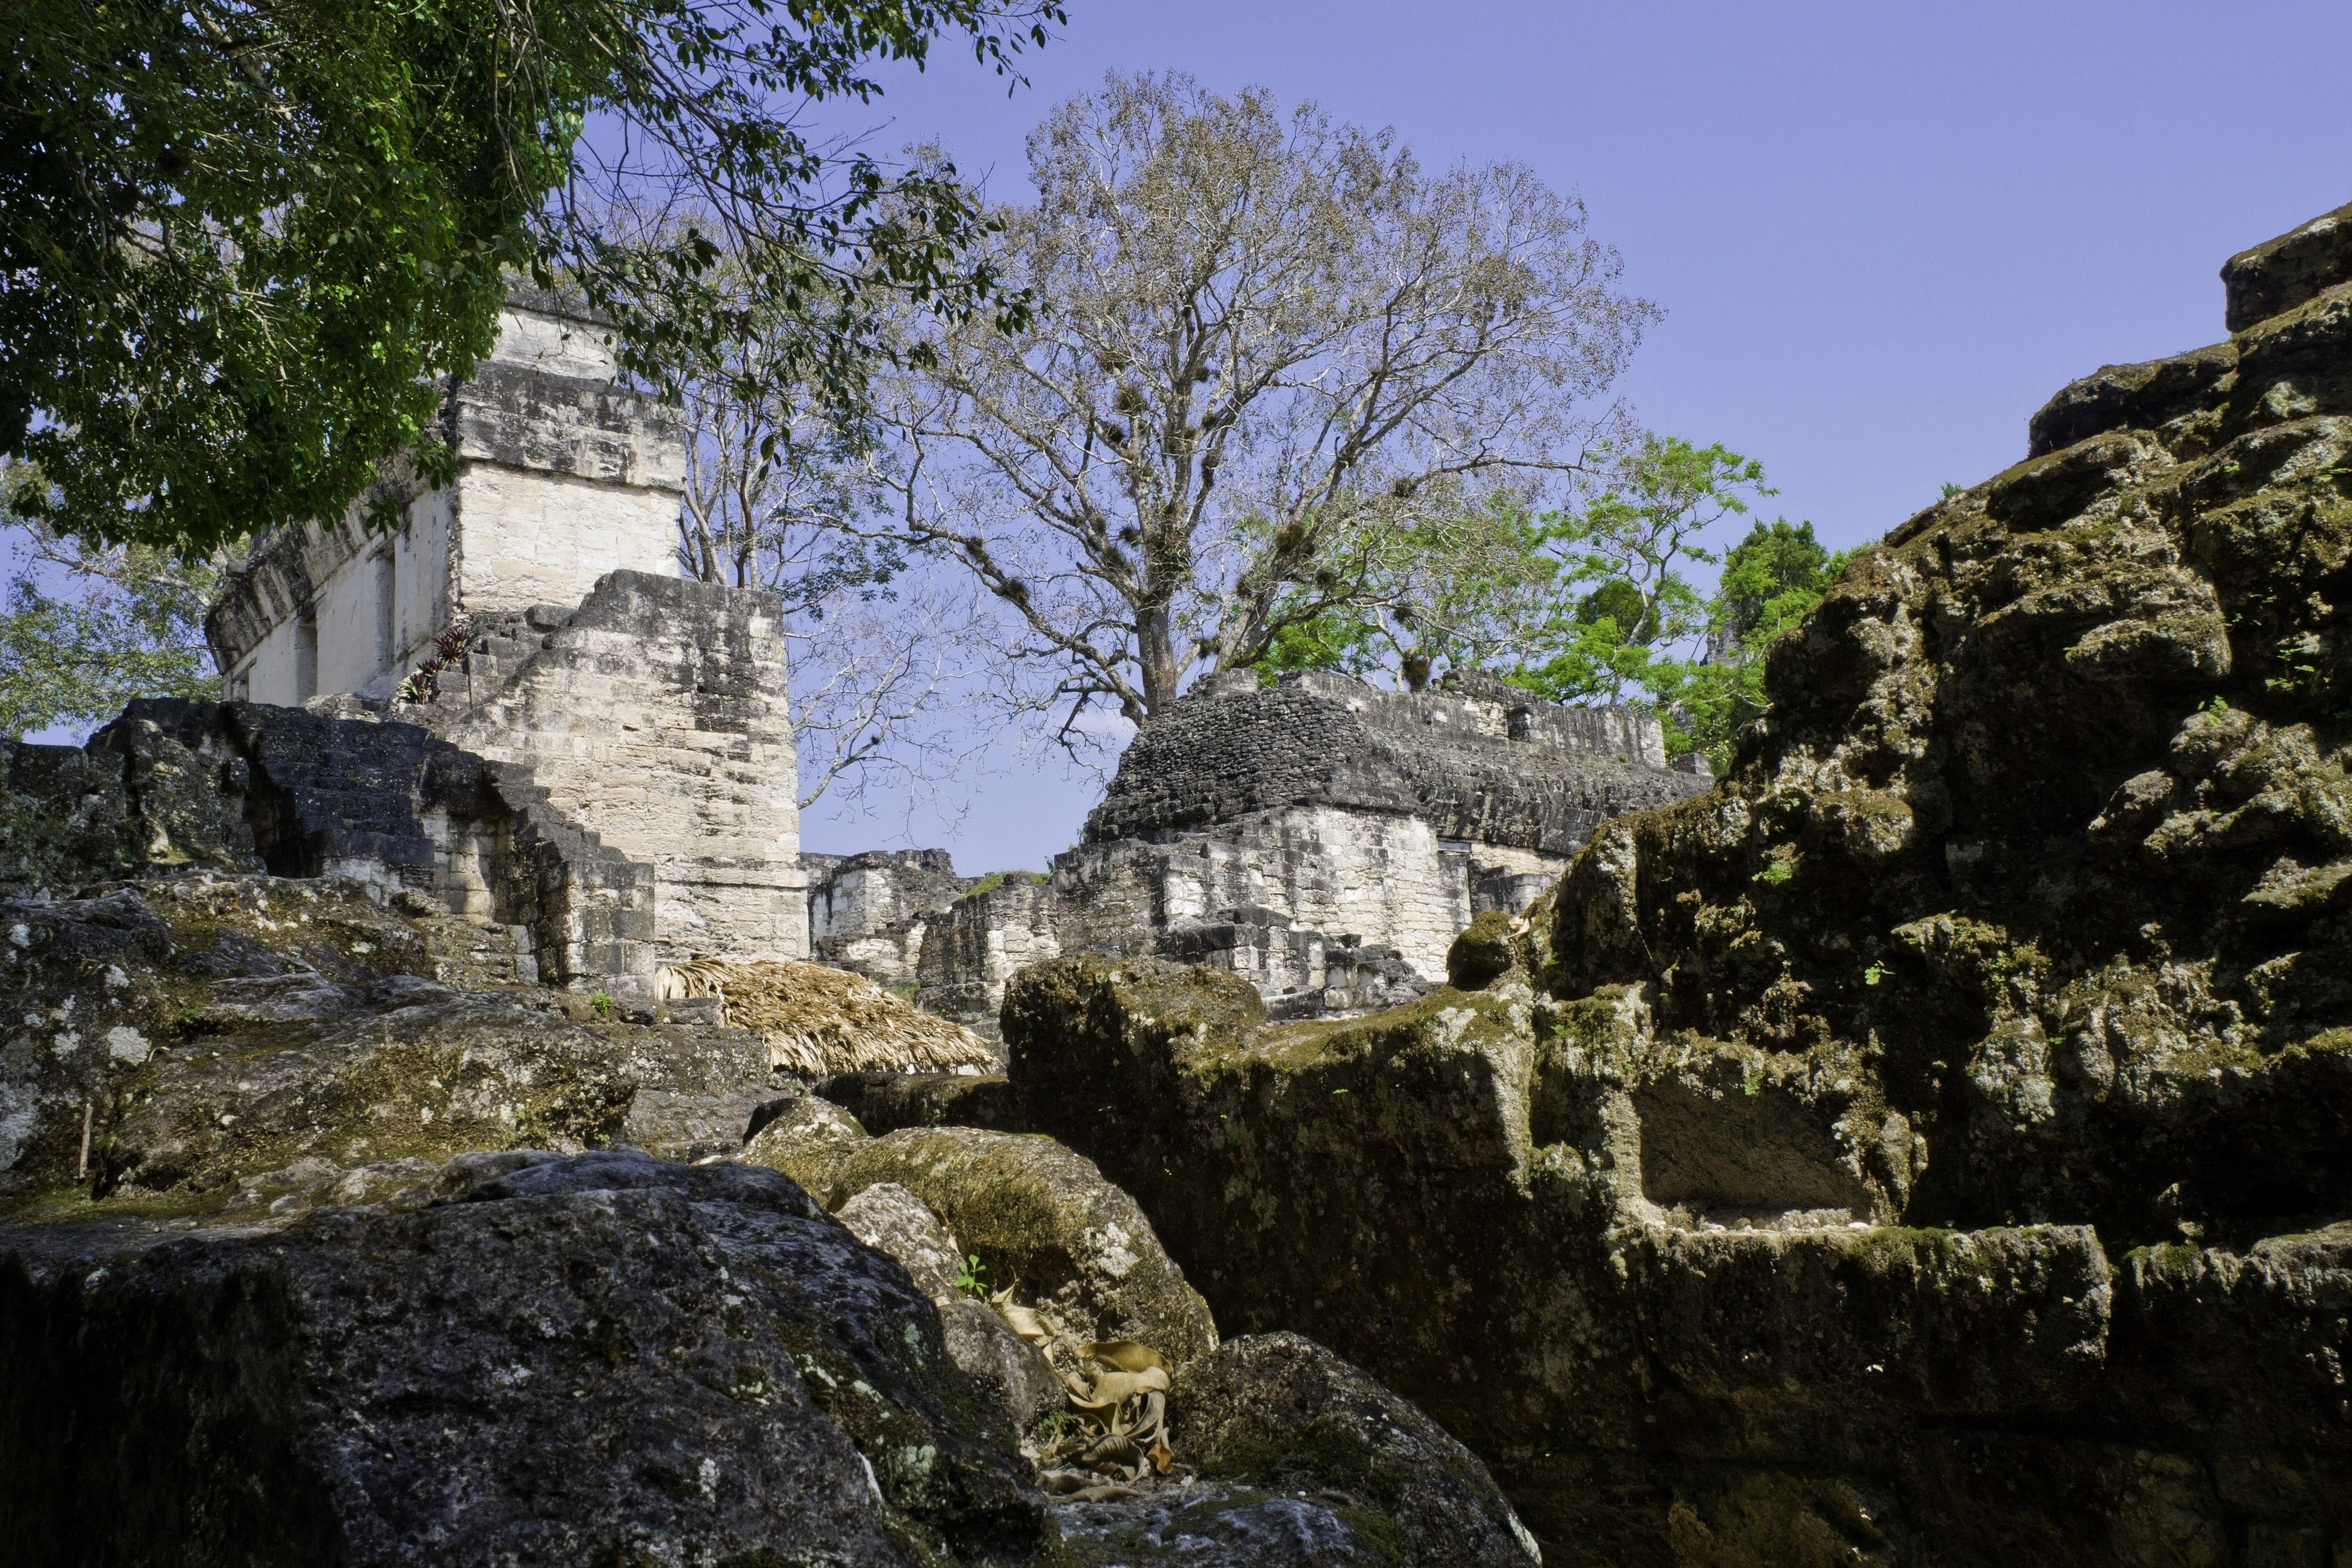 stone buildings among a rocky terrain